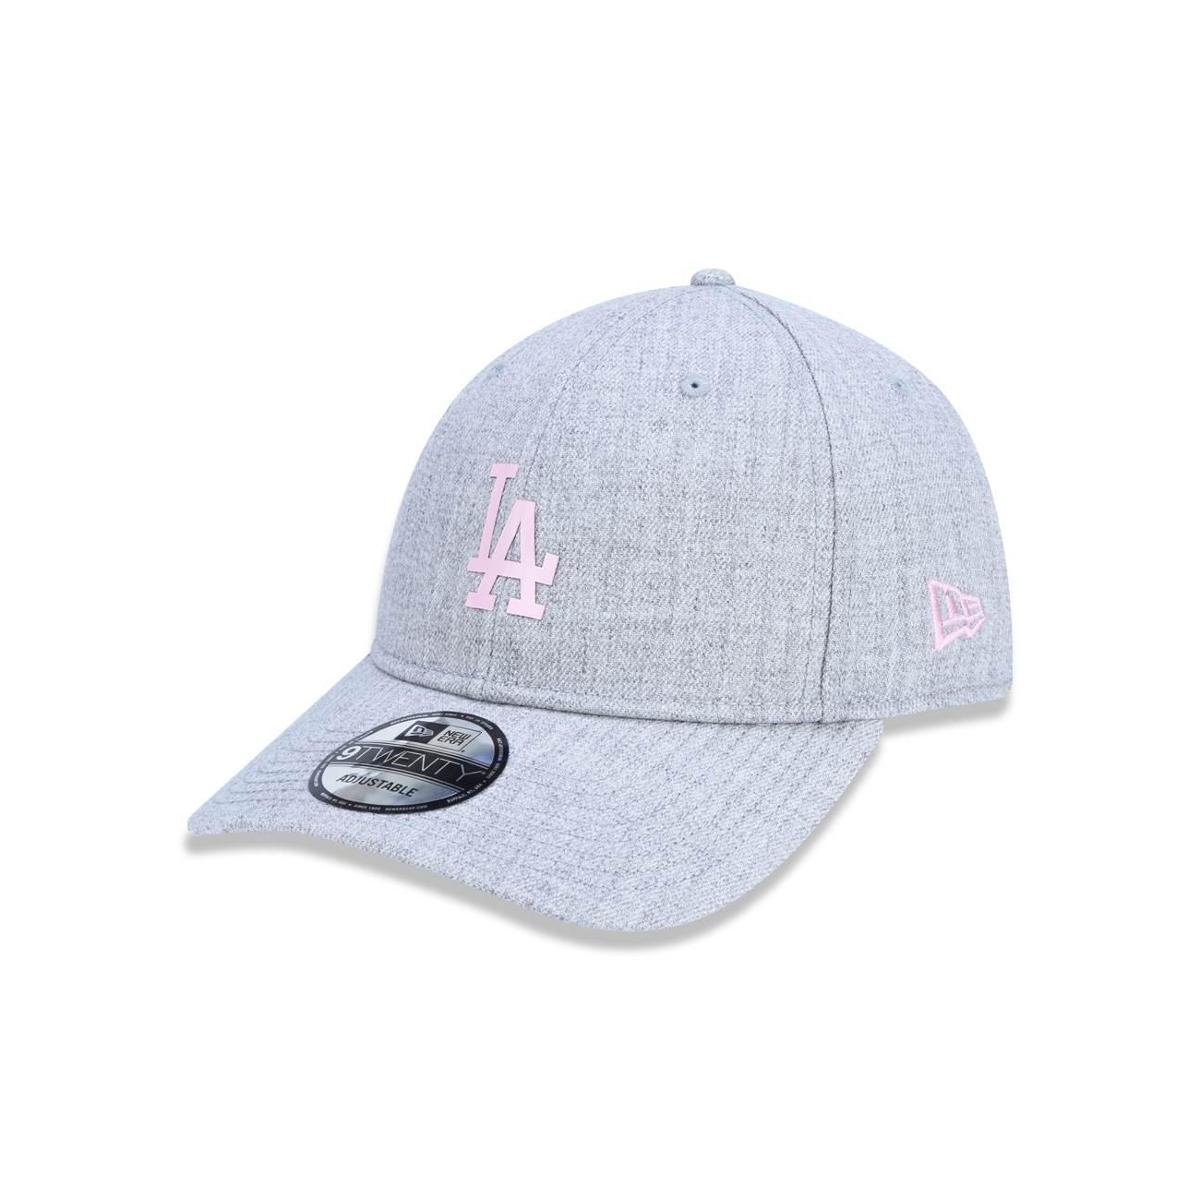 ... Aba Curva Strapback Cinza Pink New Era Ver mais. Permaneça conectado. Bone  920 Los Angeles Dodgers MLB New Era ... 1a996788883